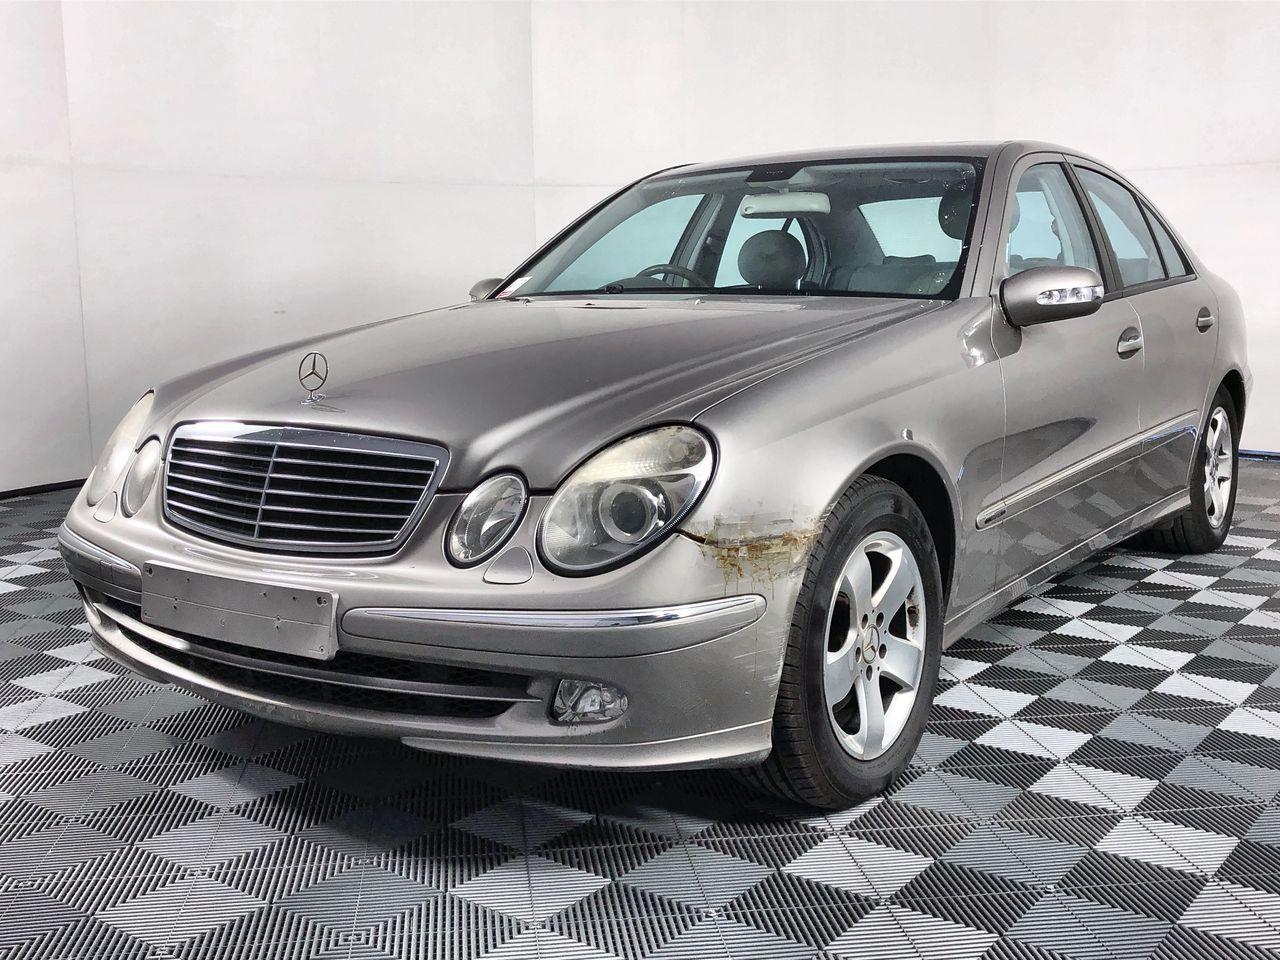 2002 Mercedes Benz E320 Elegance W211 Automatic Sedan